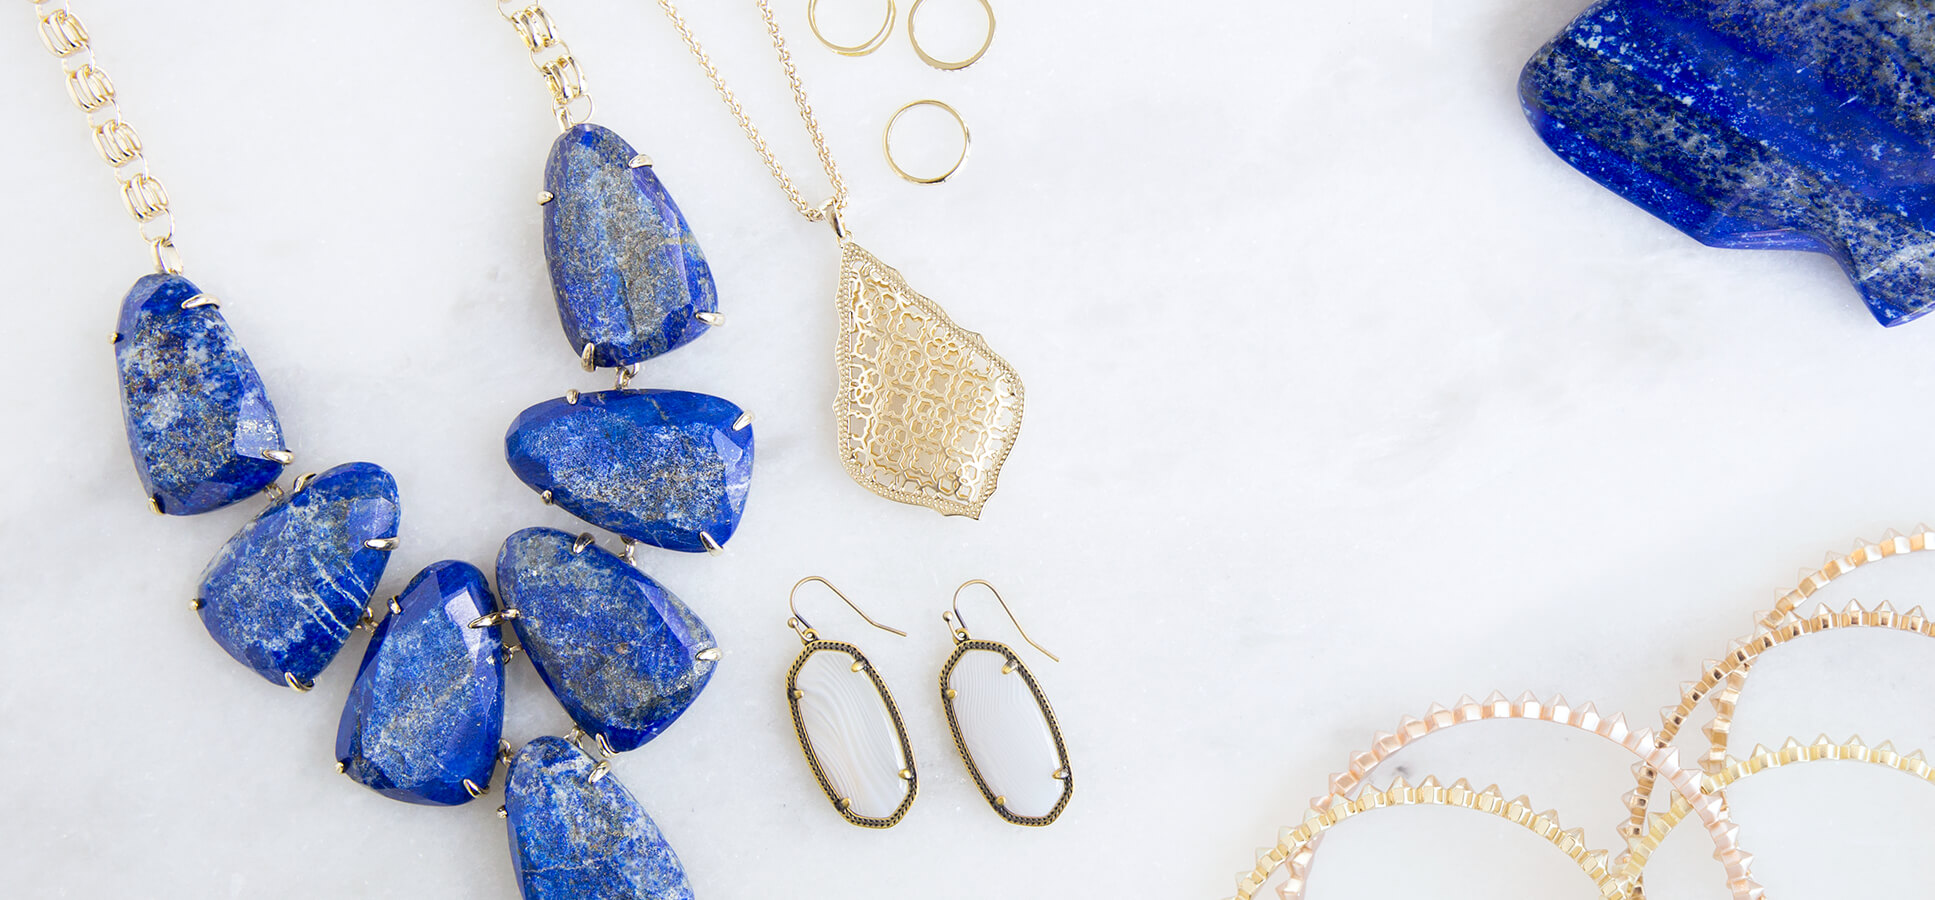 Kendra Scott Fall 2016 Gold and Lapis jewelry